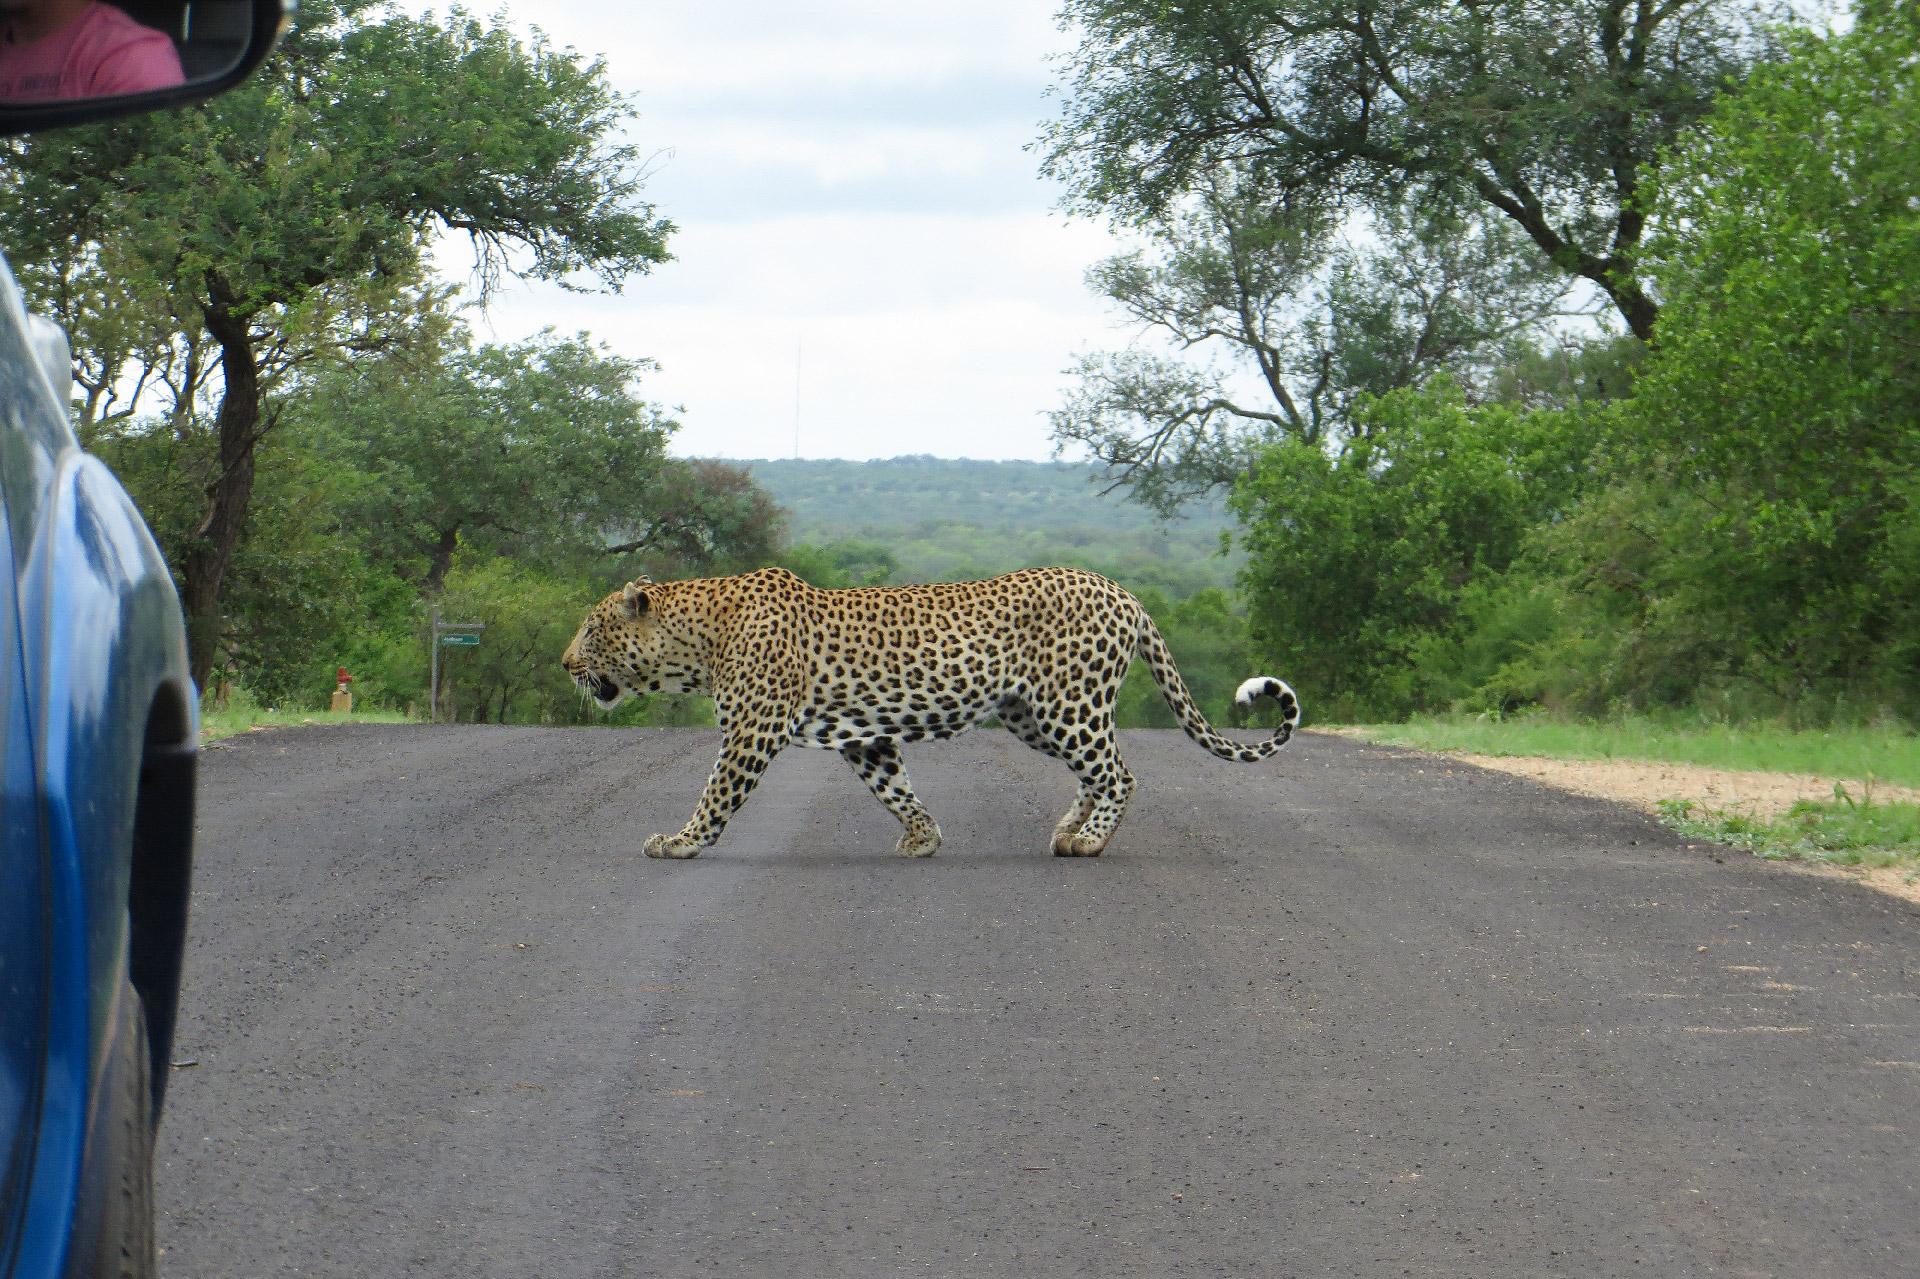 A relaxed Big Boy strolls confidently across a road